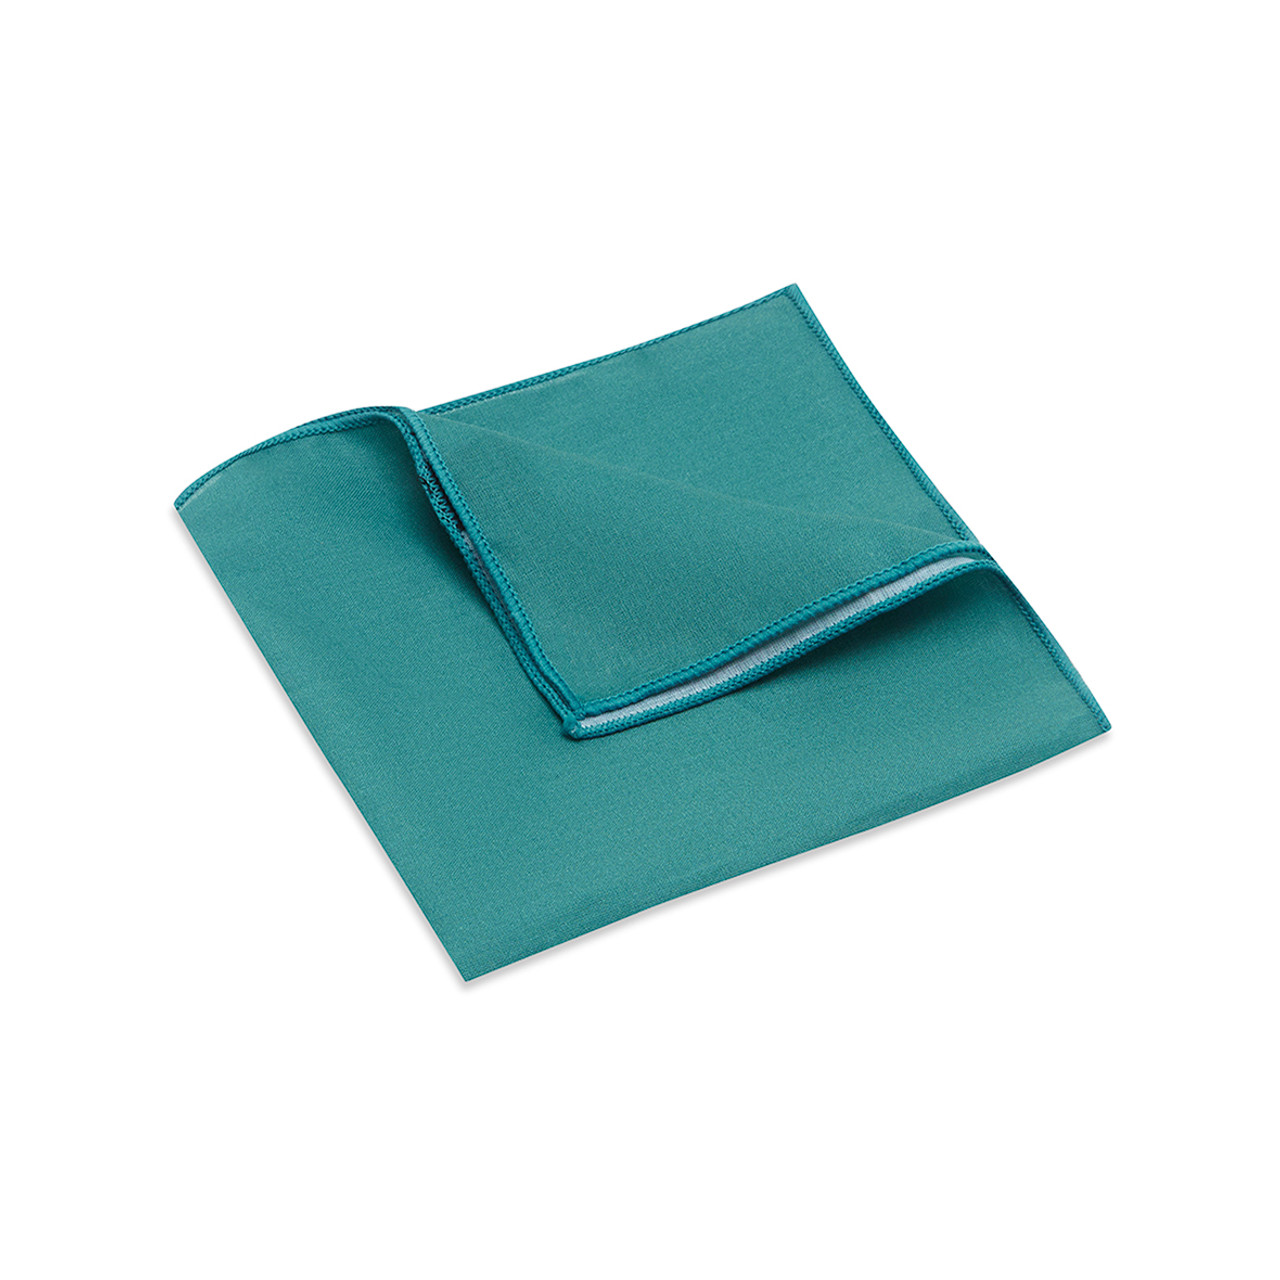 Pocket Square, Plain, Teal